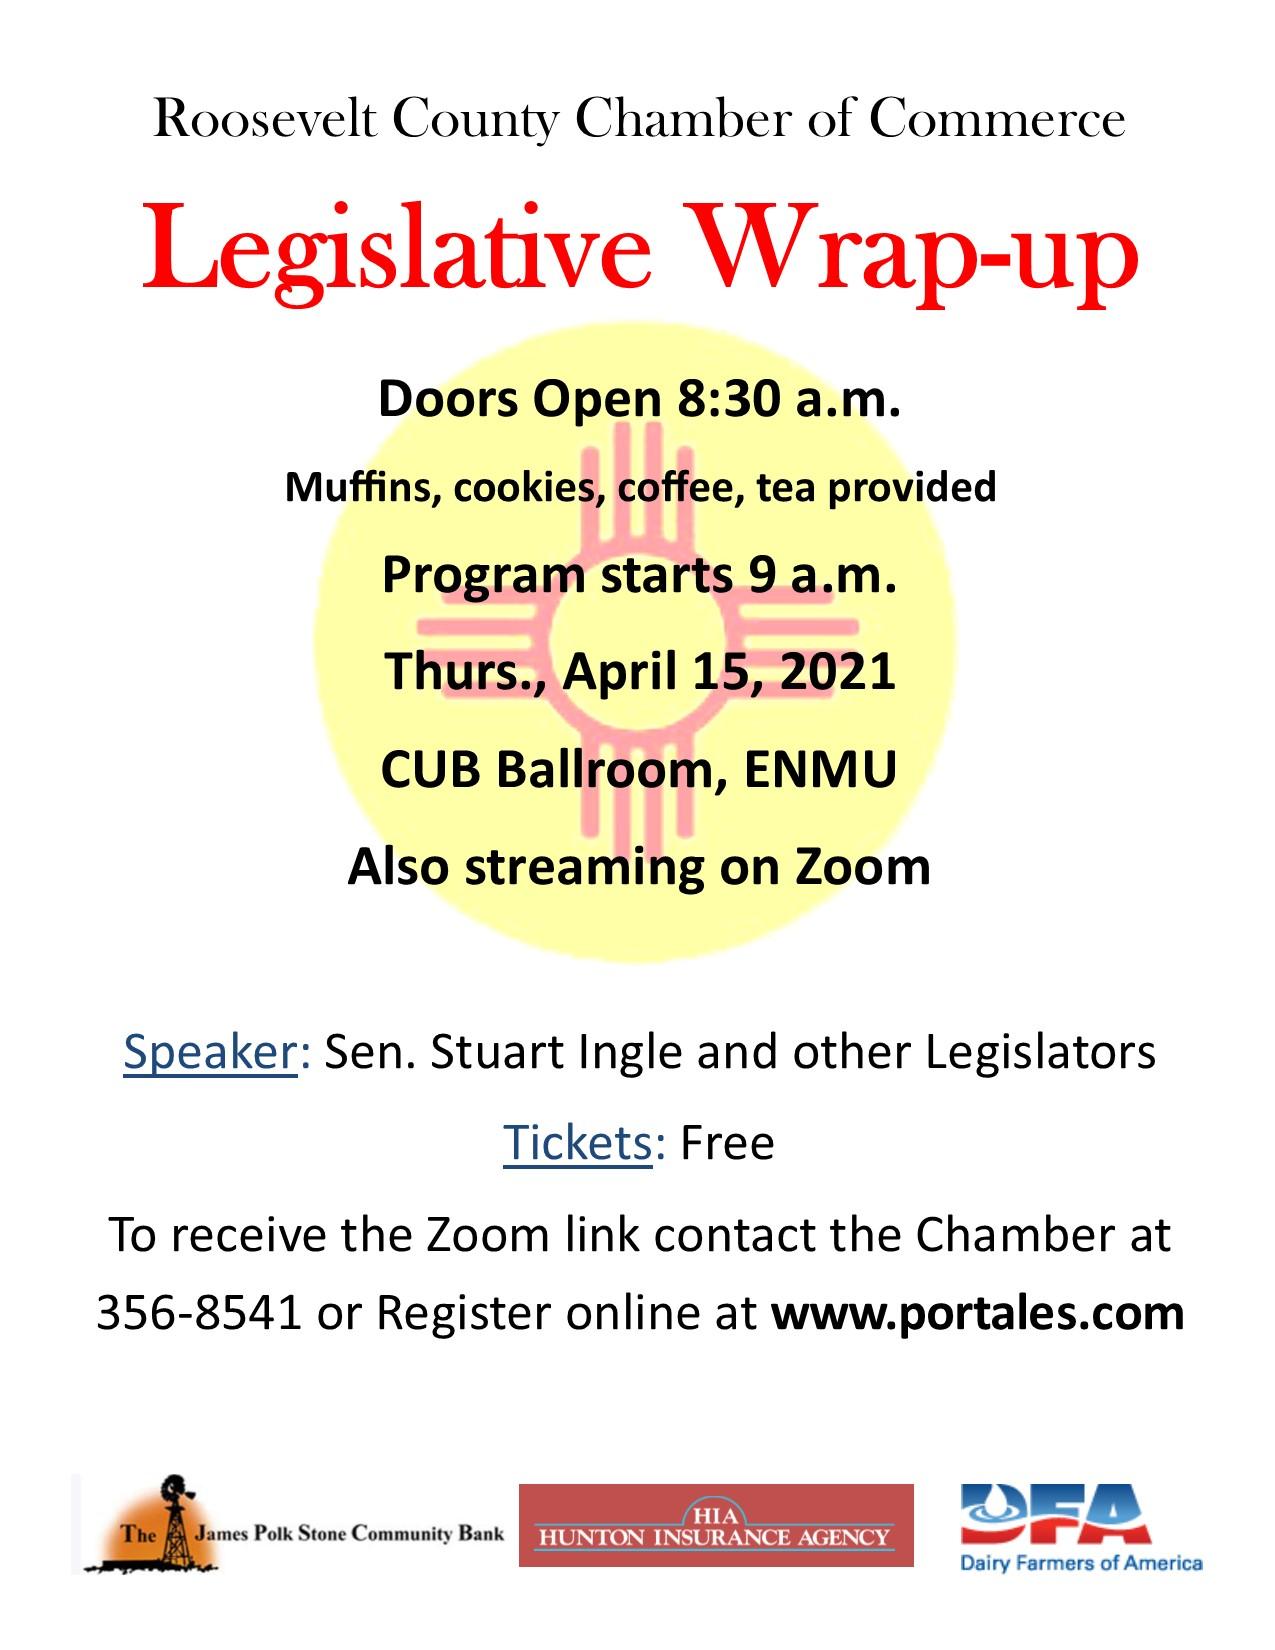 Legislative-Wrap-up-4-15-21.jpg